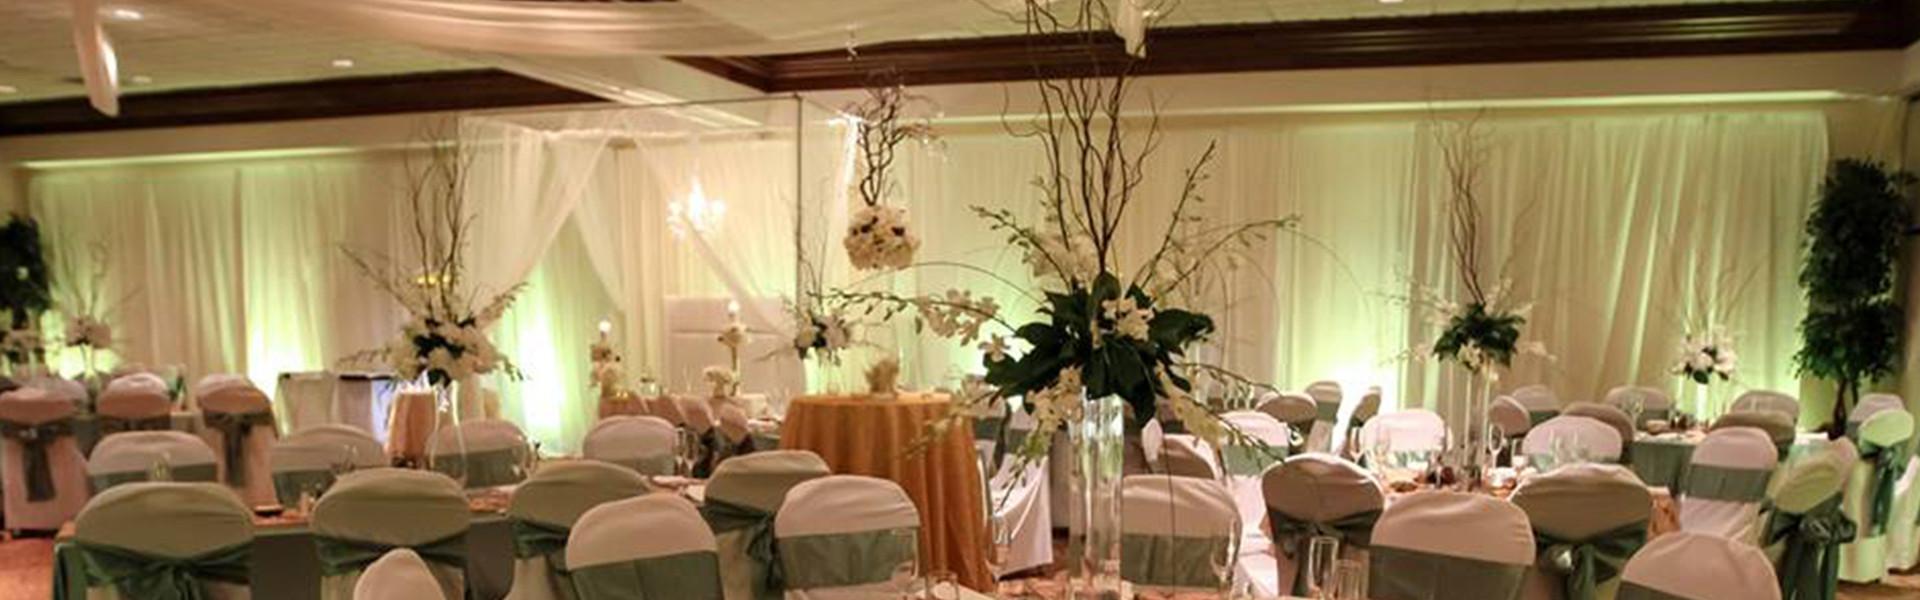 Wedding Options in Las Vegas NV   Westgate Las Vegas Resort & Casino